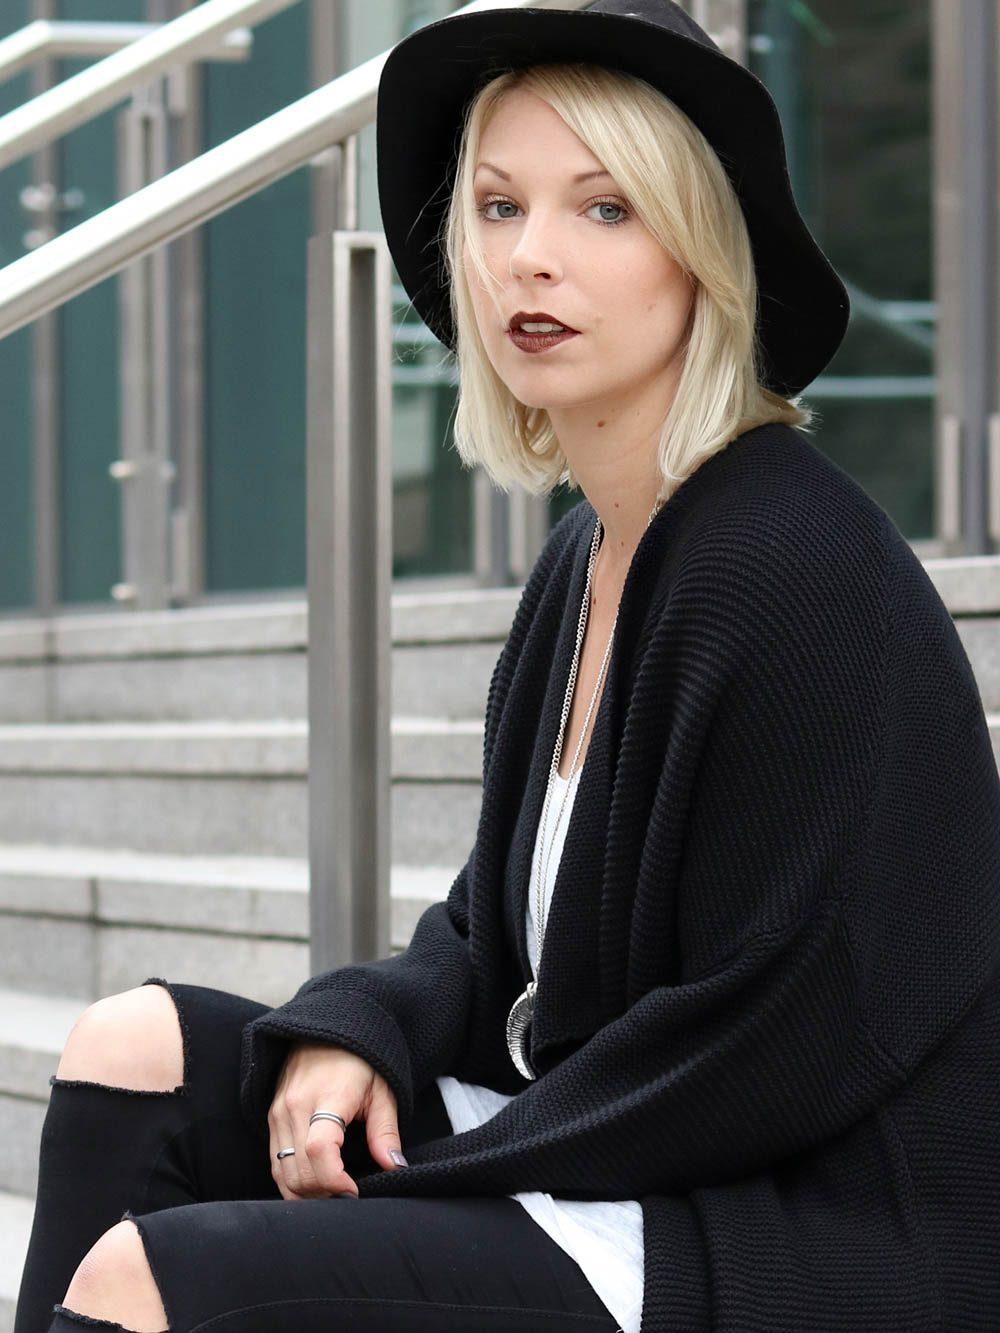 fashionblogger-mannheim-outfit-longcardigan-nike-air-max-skinnyjeans-rucksack-11-von-20